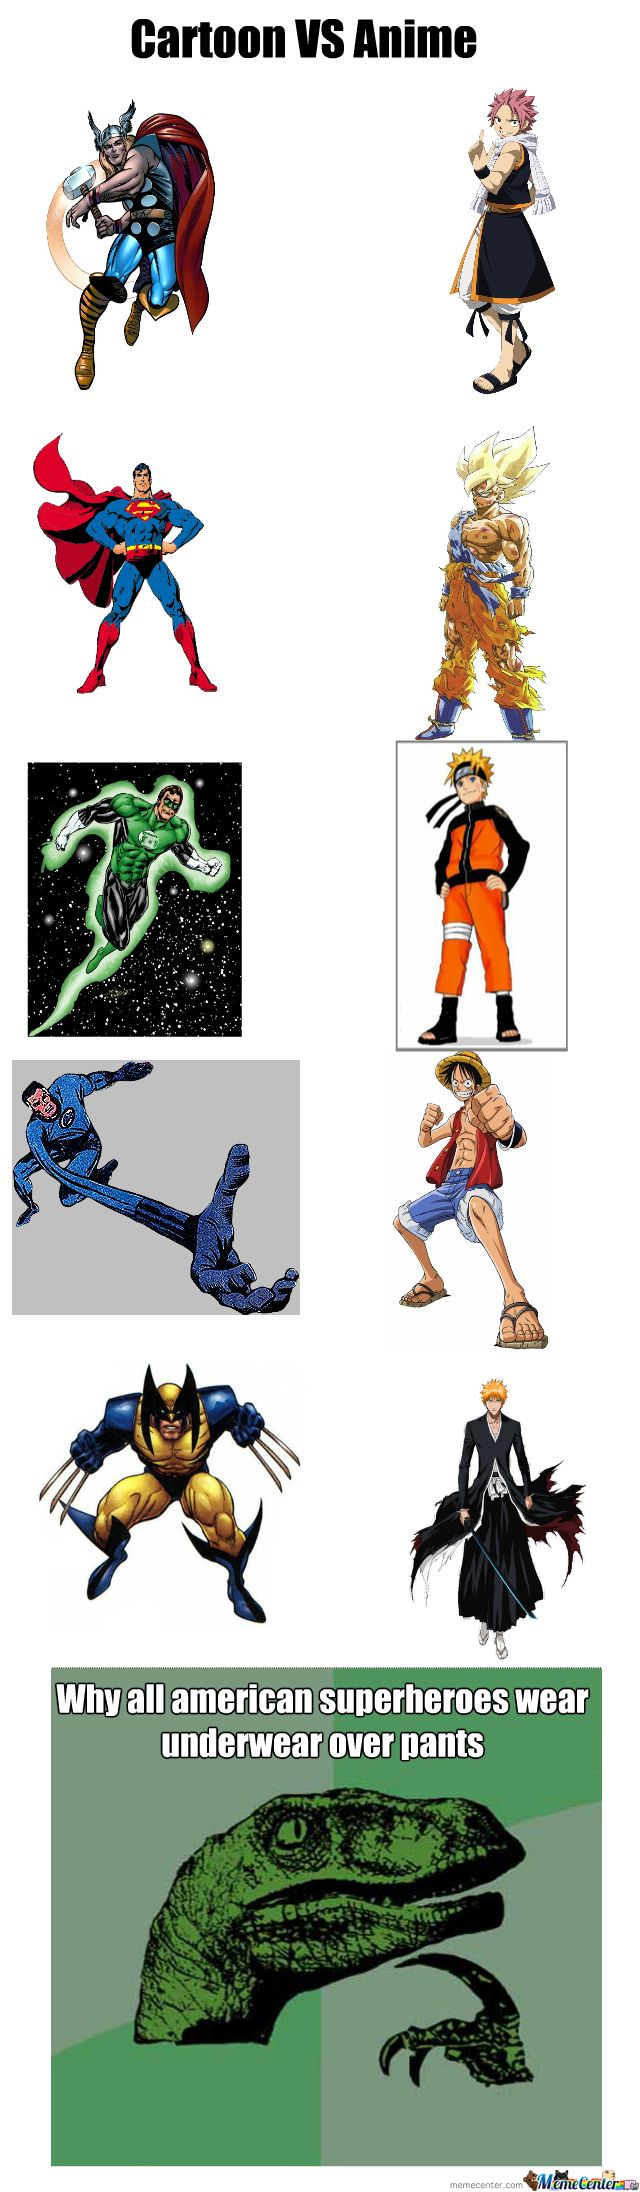 cartoon vs anime - Google Search